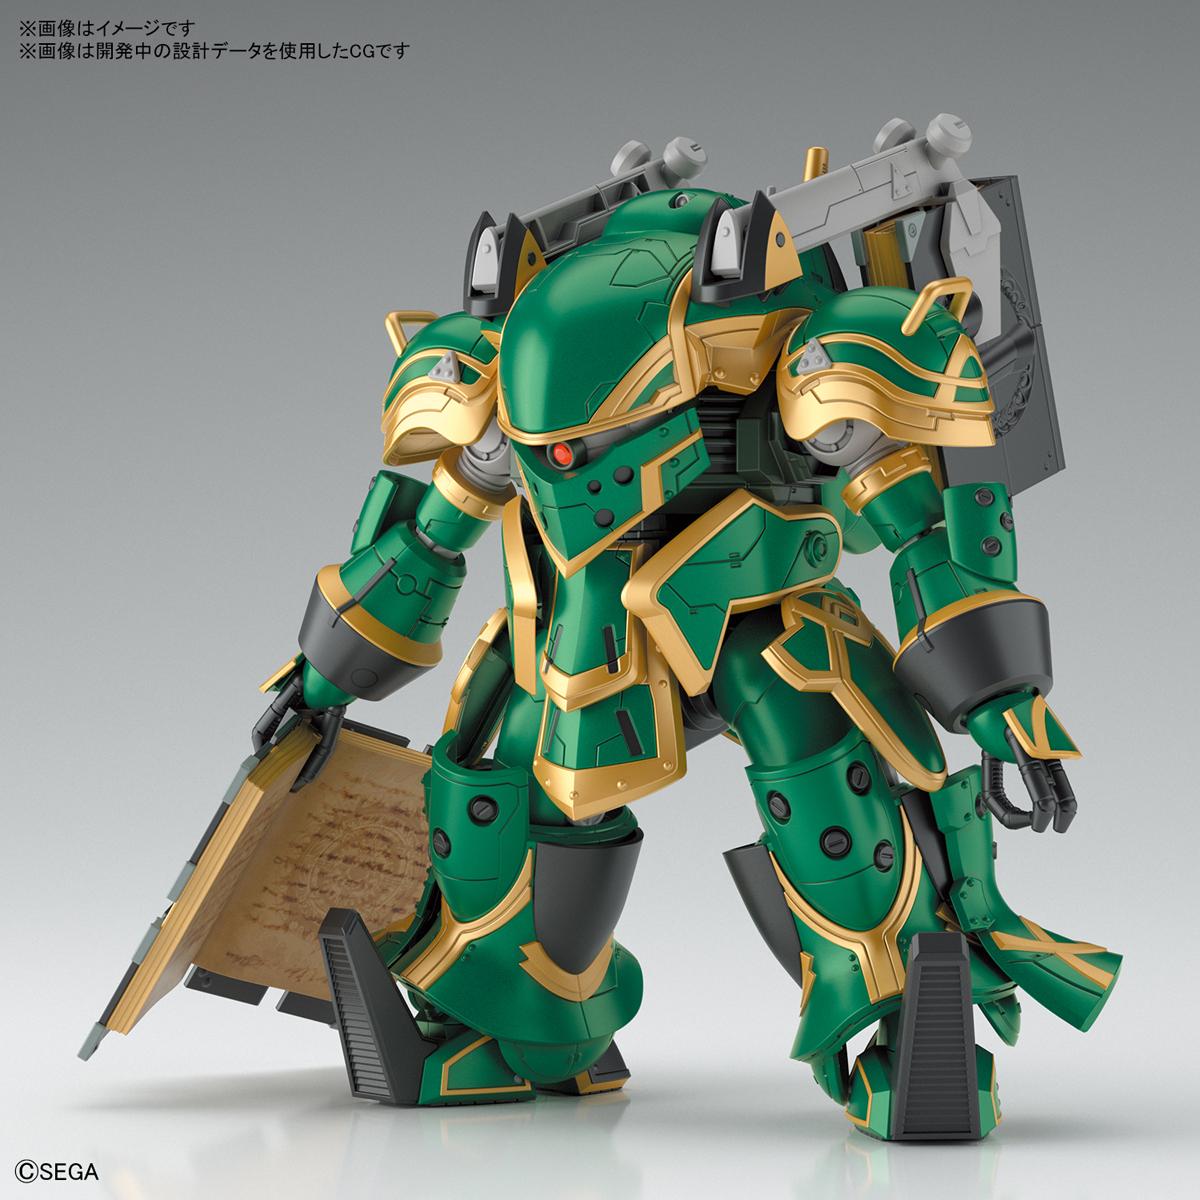 HG 1/24『霊子戦闘機・無限(クラリス機)』新サクラ大戦 プラモデル-001